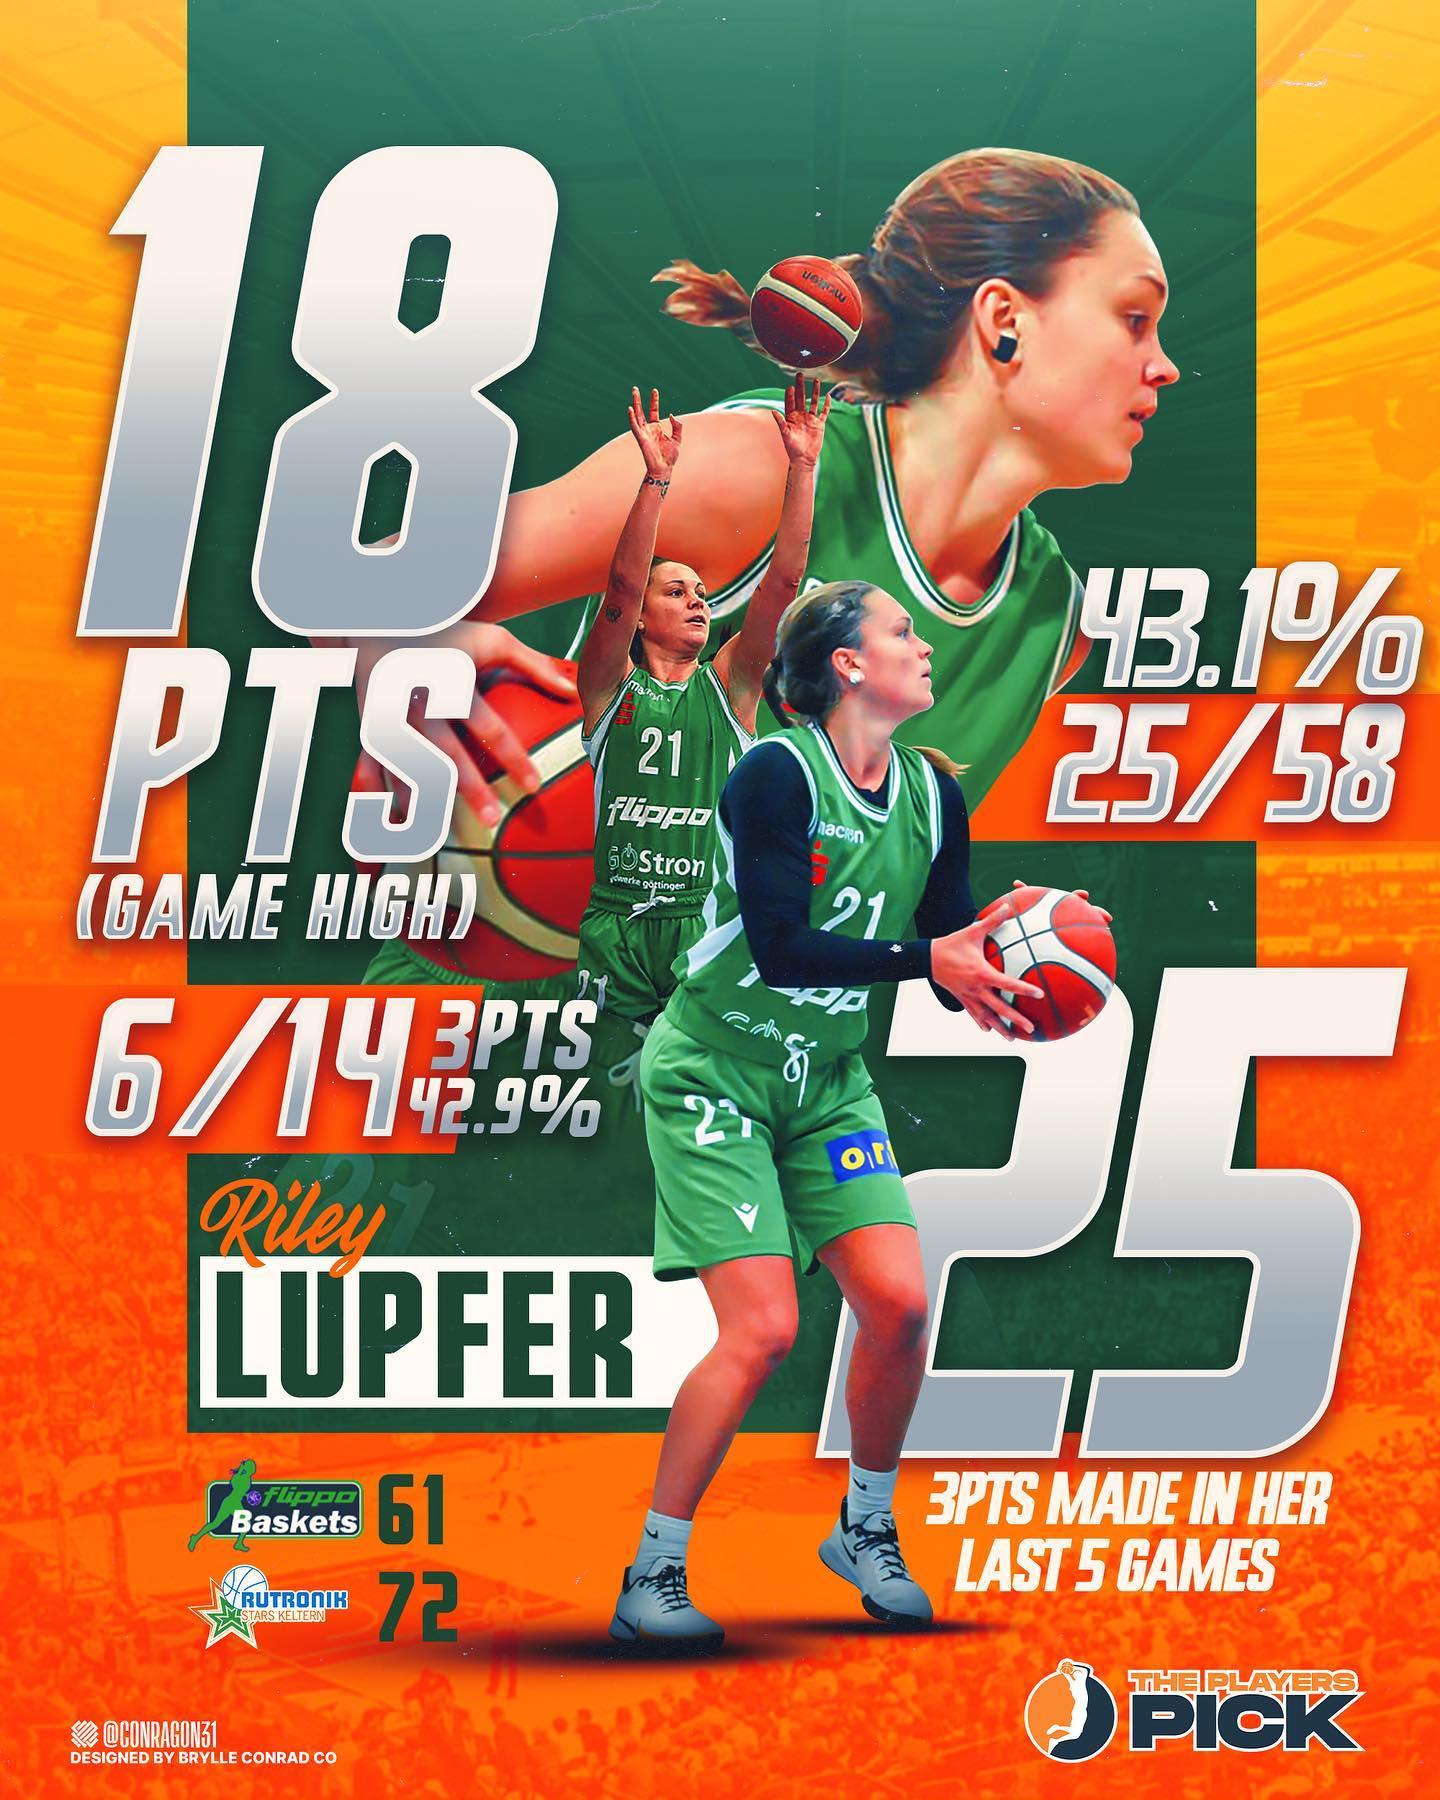 Lupfer keeps shining in Germany – 6 three point shots made – Top Scorer again vs Keltern!